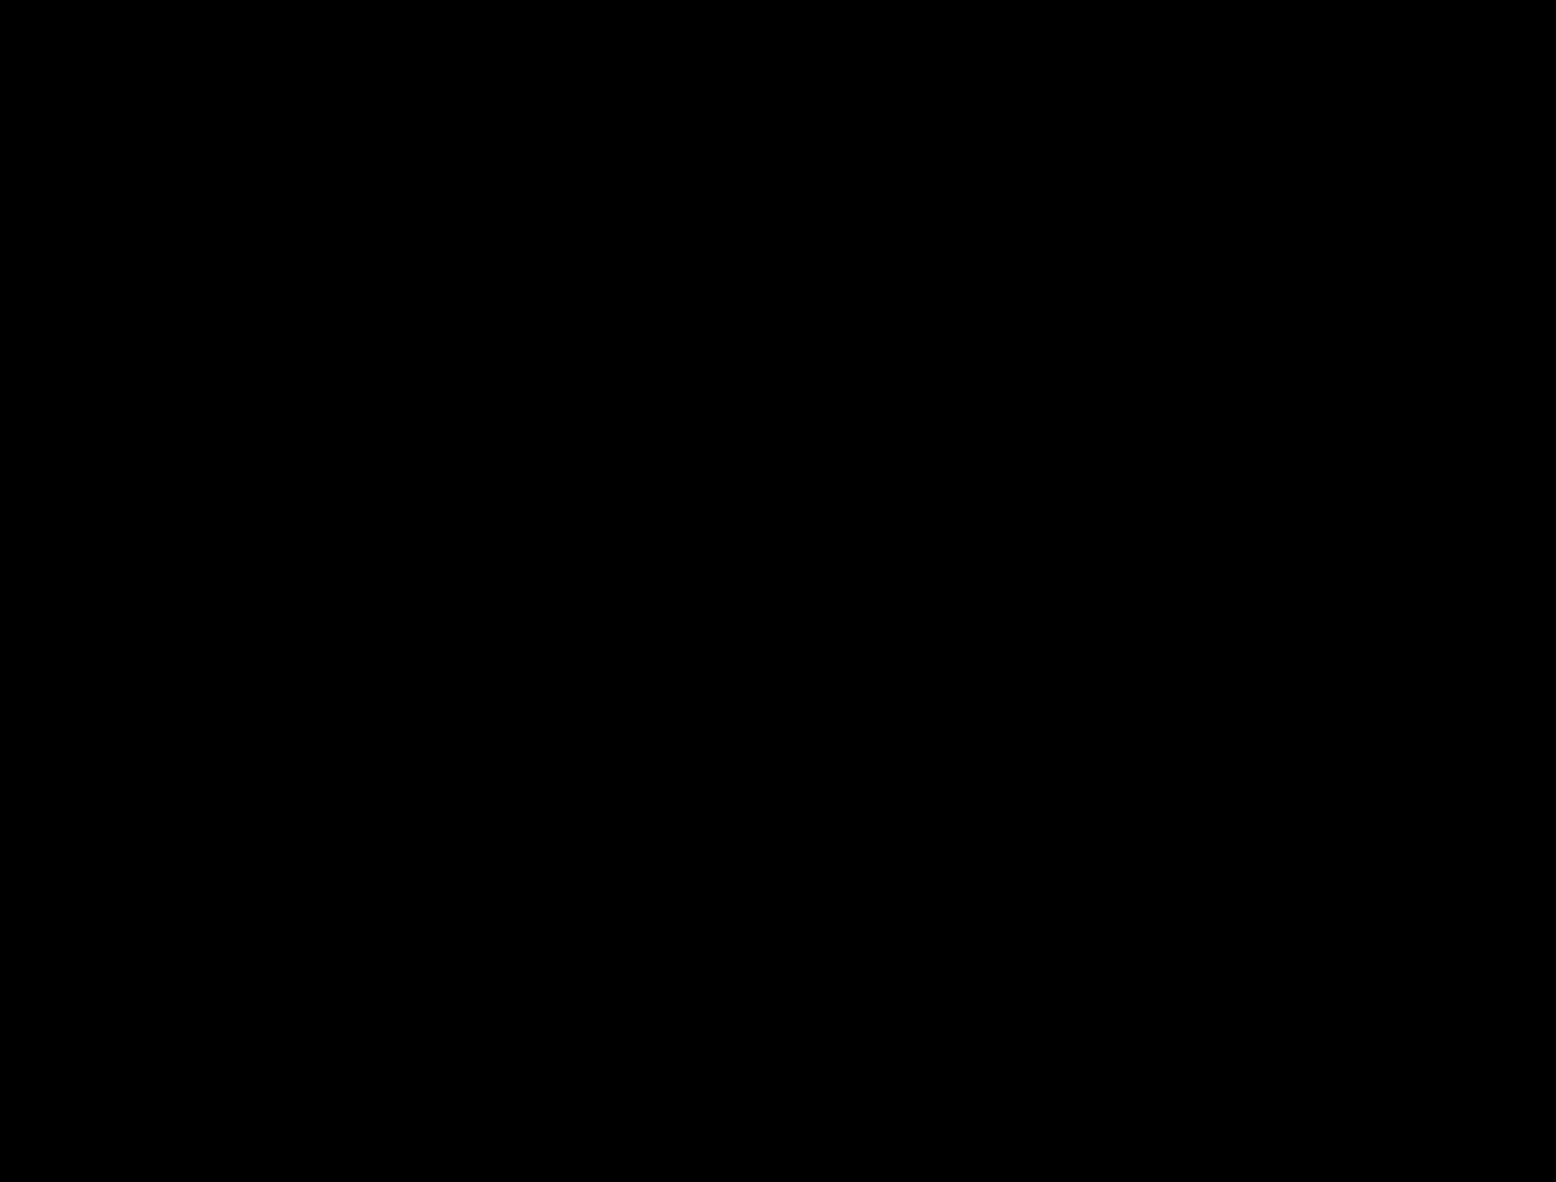 delta23-FK-506